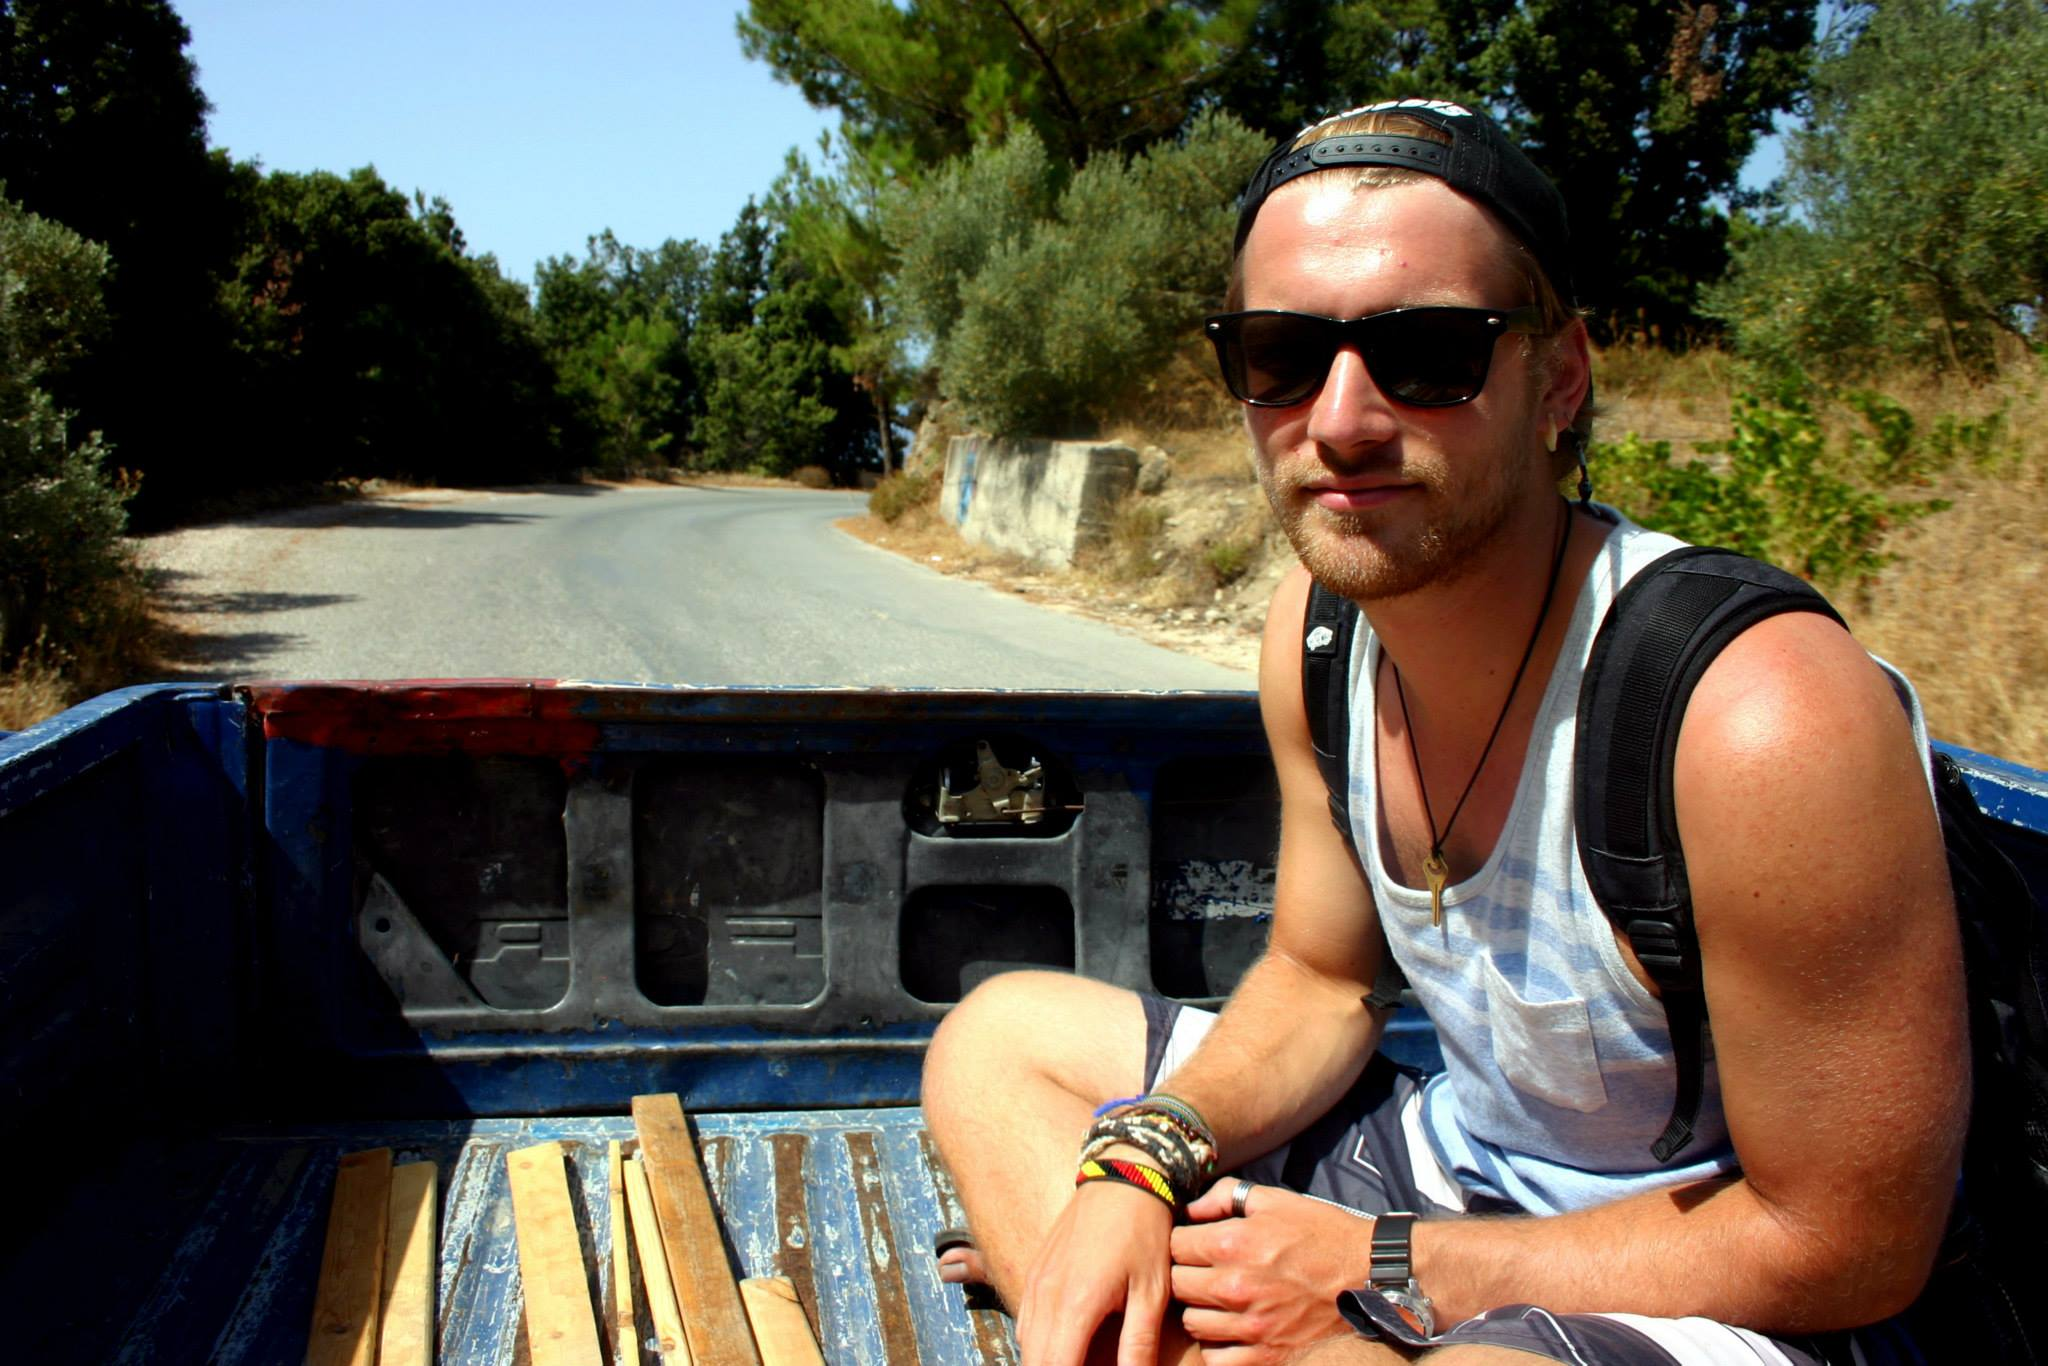 hitchhike pickup truck side 1